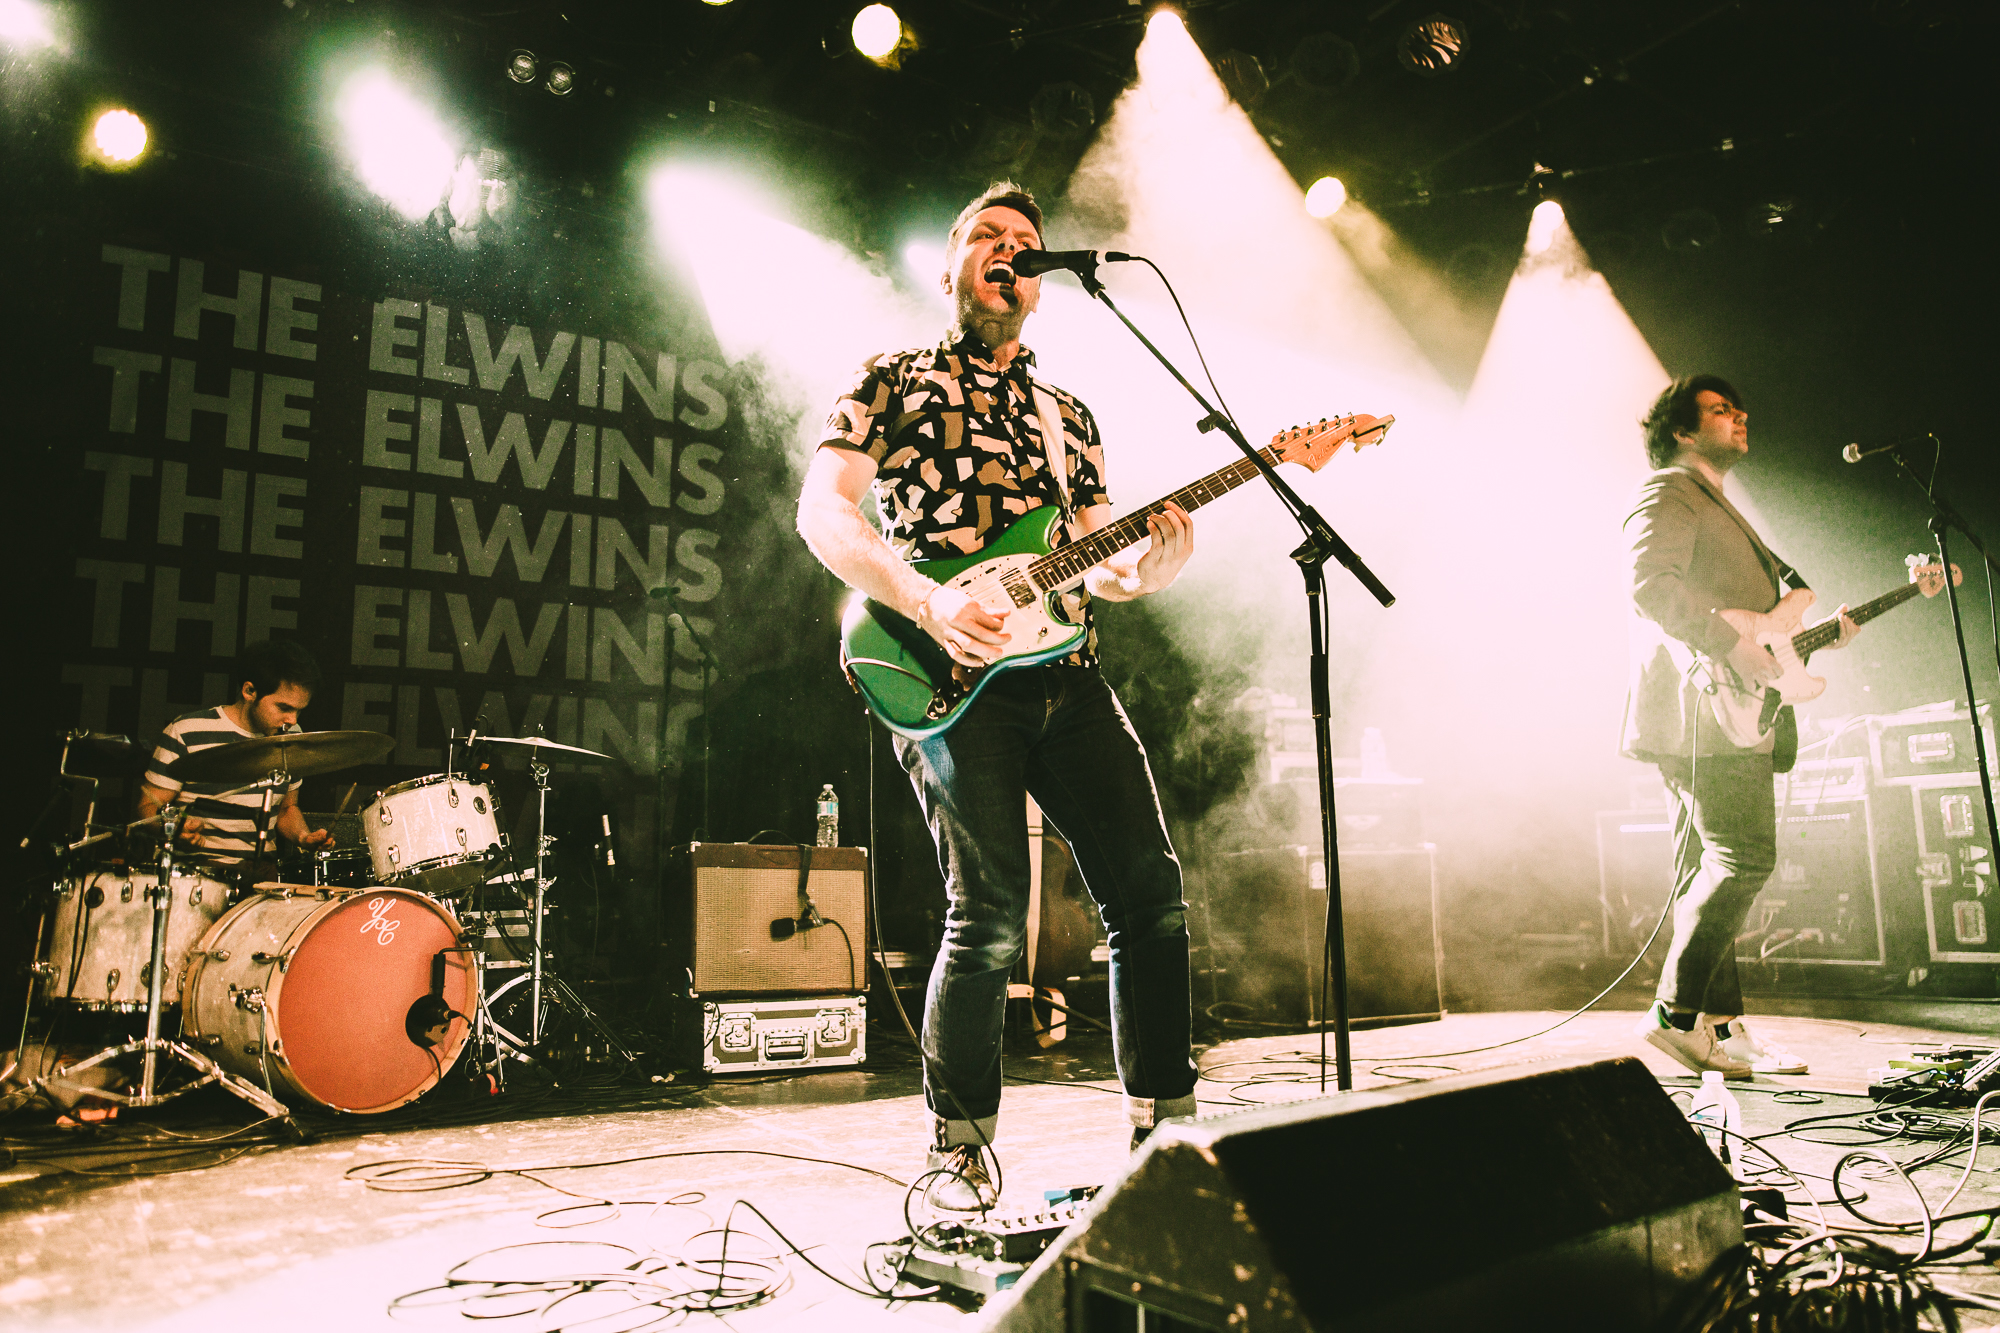 The-Elwins-1.jpg